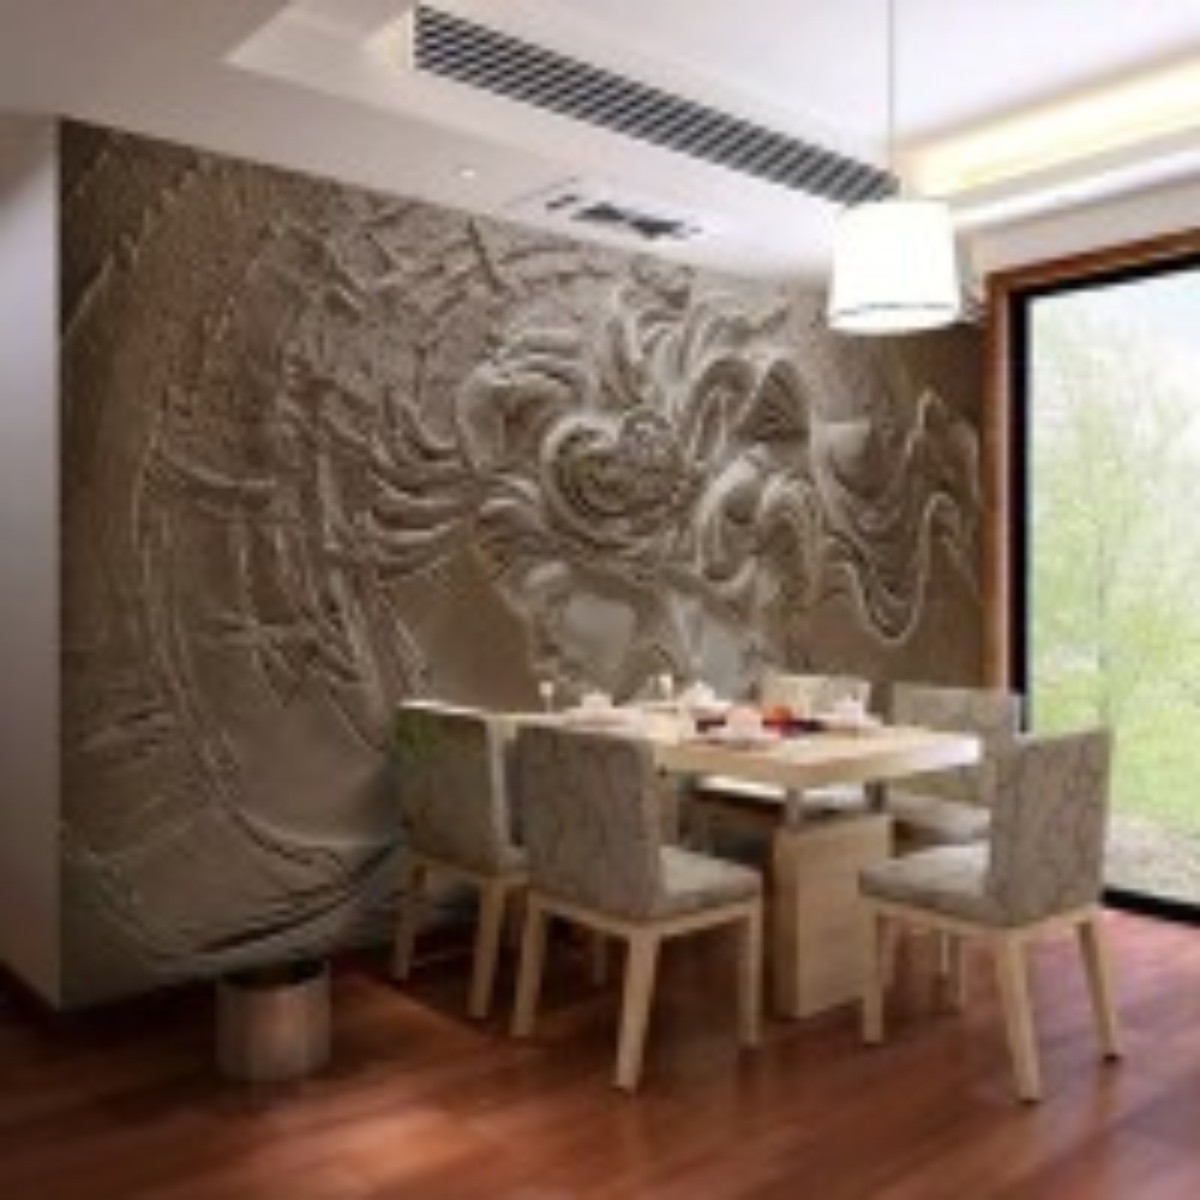 3D Embossed Look Cement Female Sculpture Wallpaper Mural